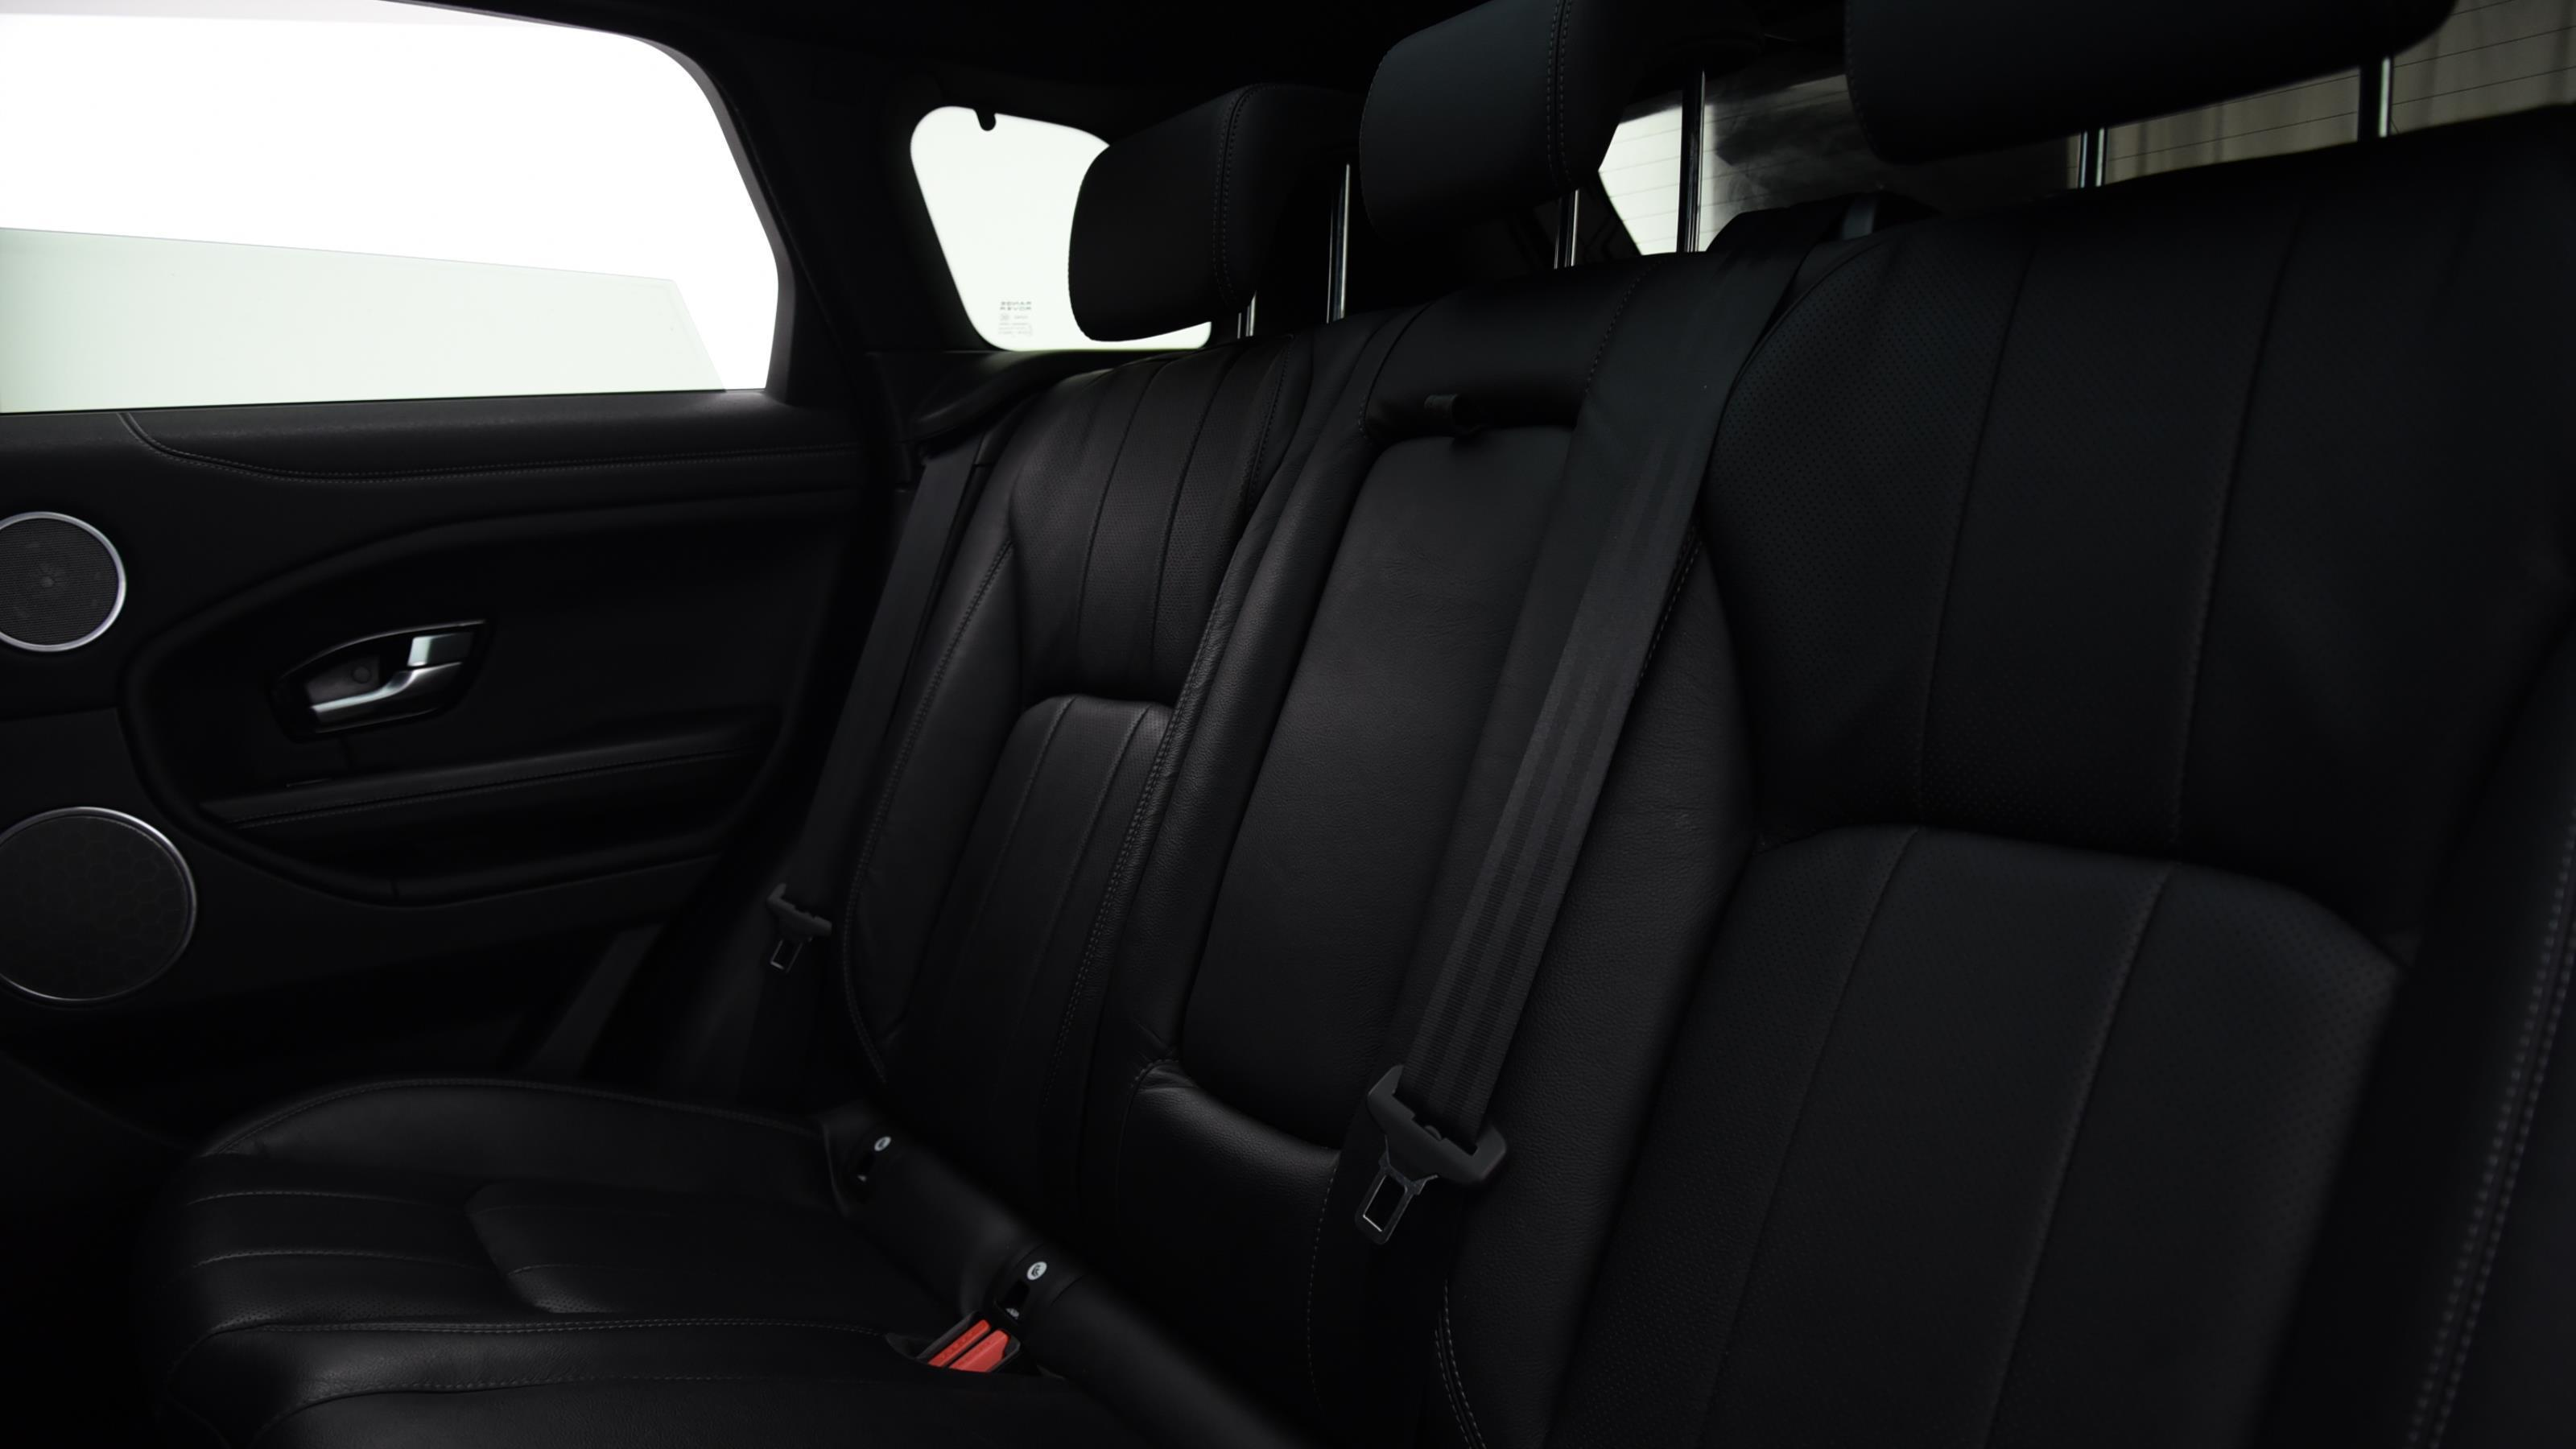 Used 15 Land Rover RANGE ROVER EVOQUE 2.0 TD4 SE Tech 5dr Auto GREY at Saxton4x4